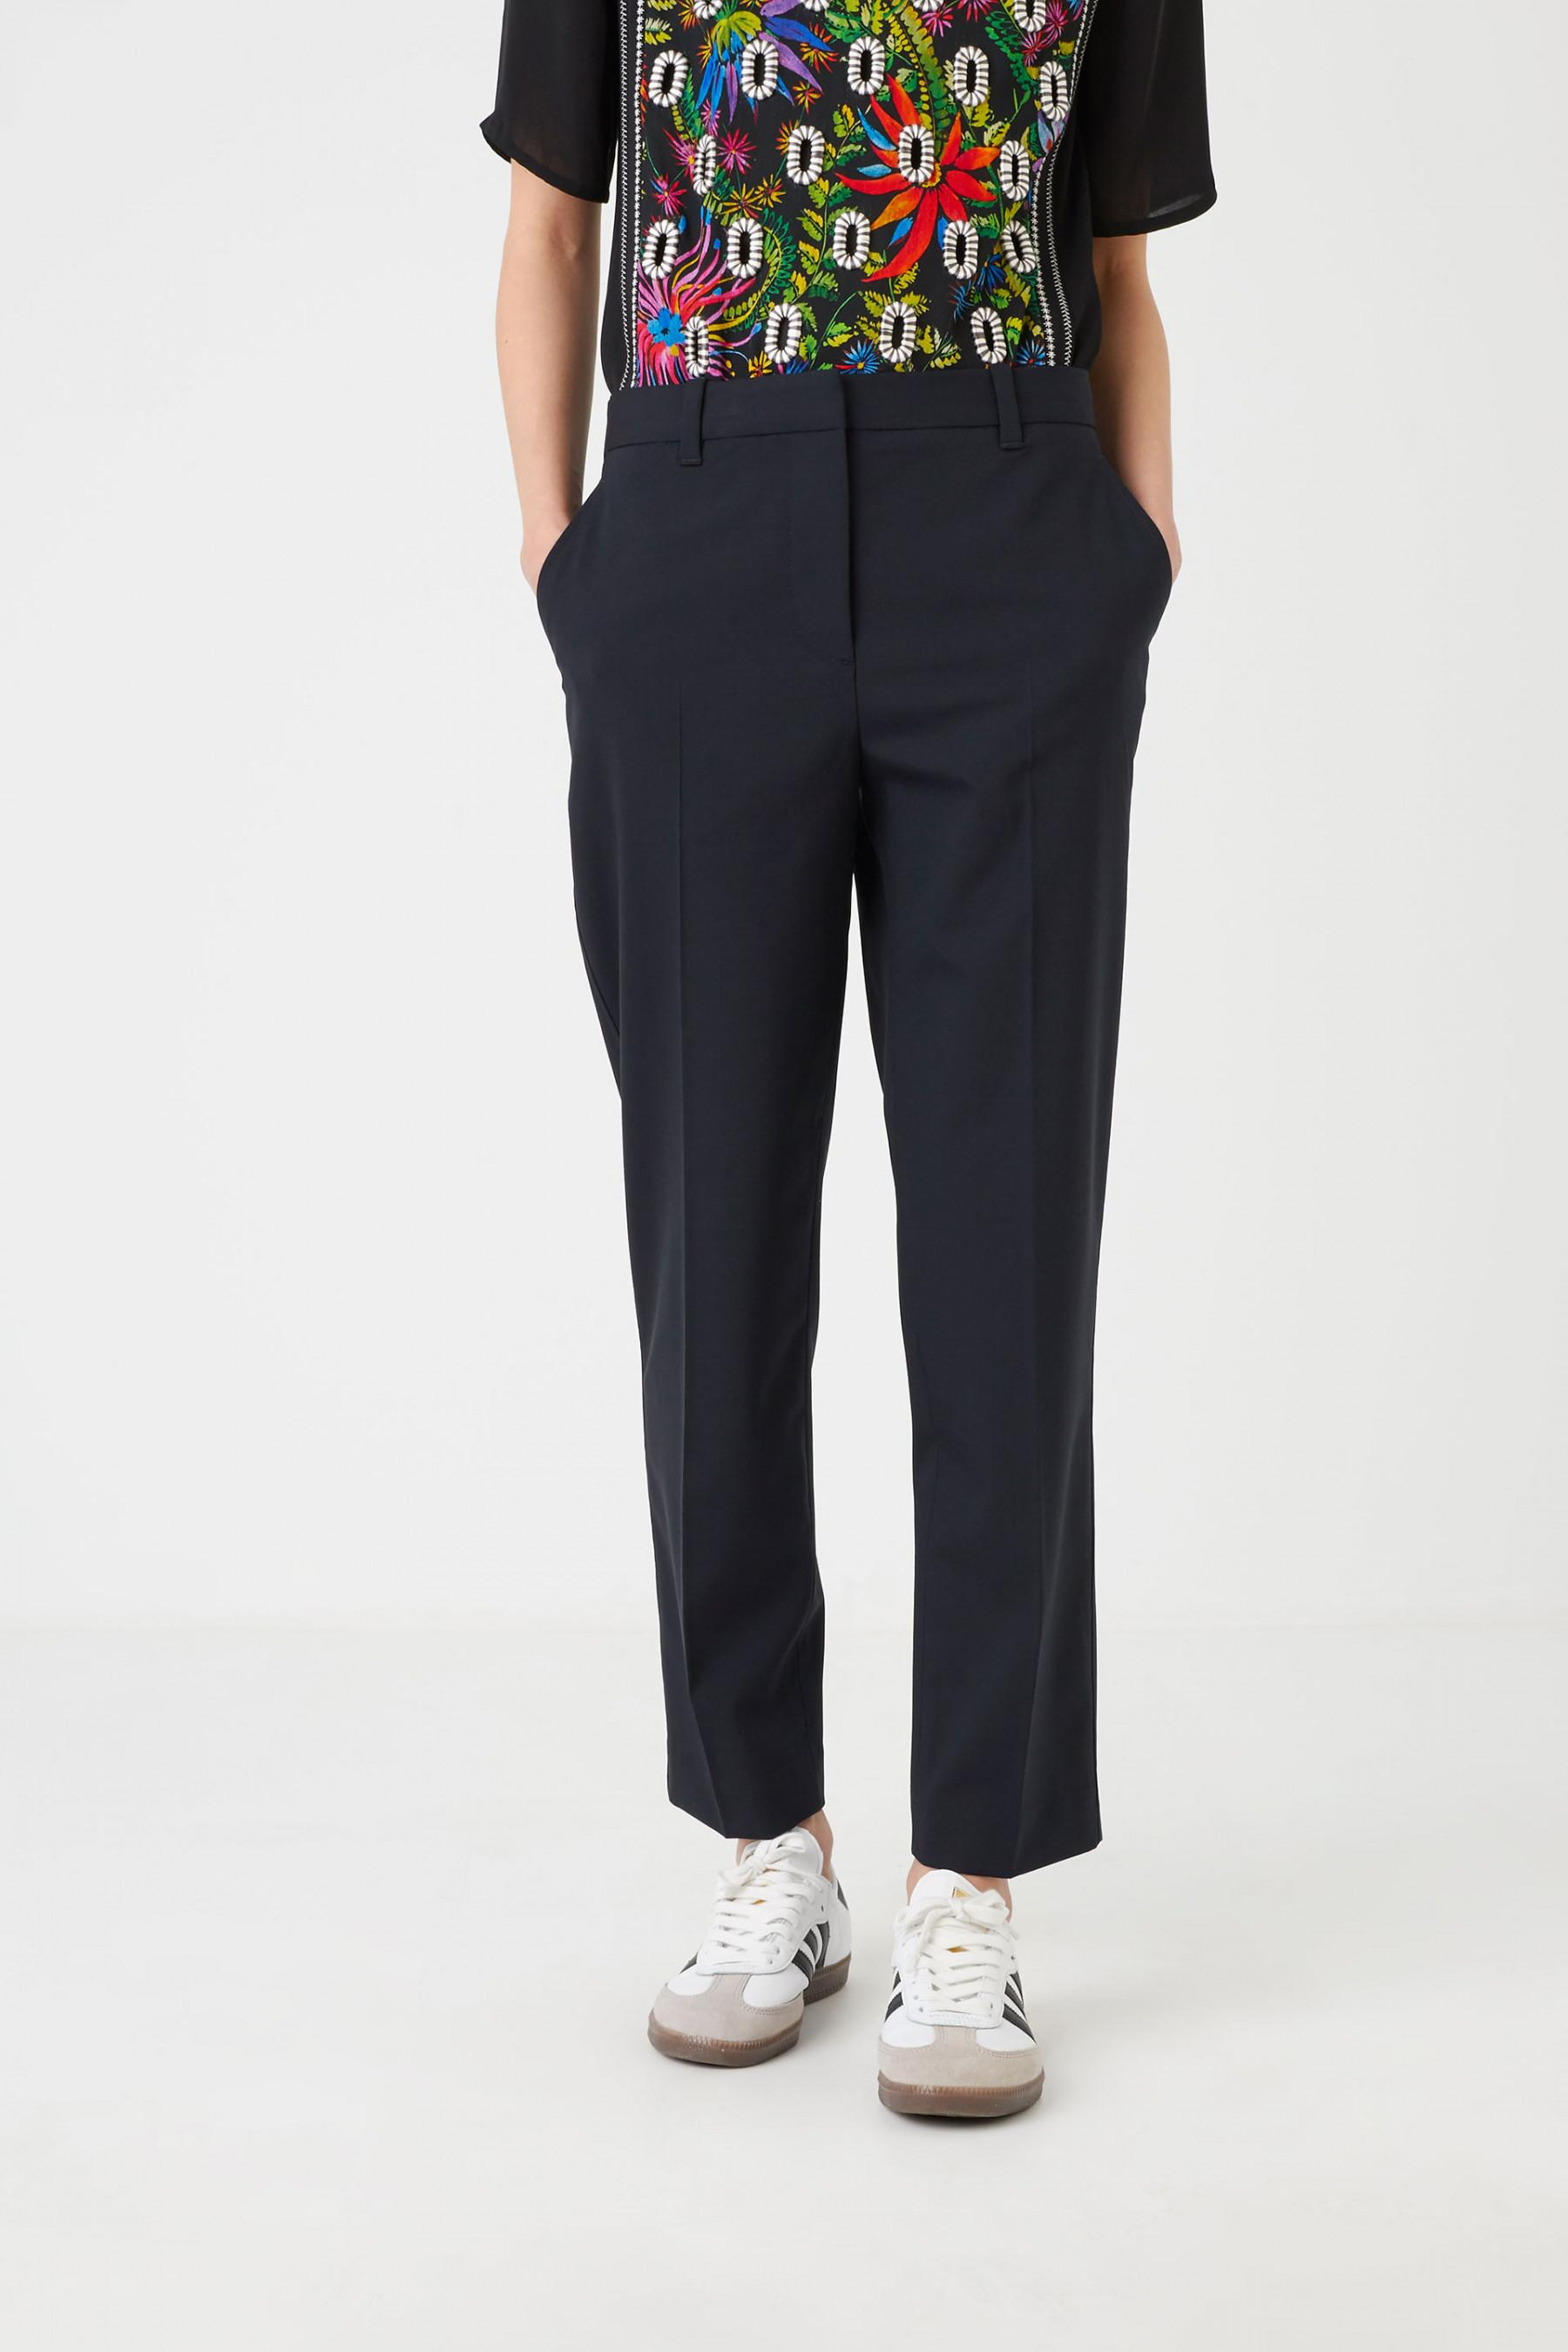 3.1 phillip lim Pencil Pants in Blue   Lyst